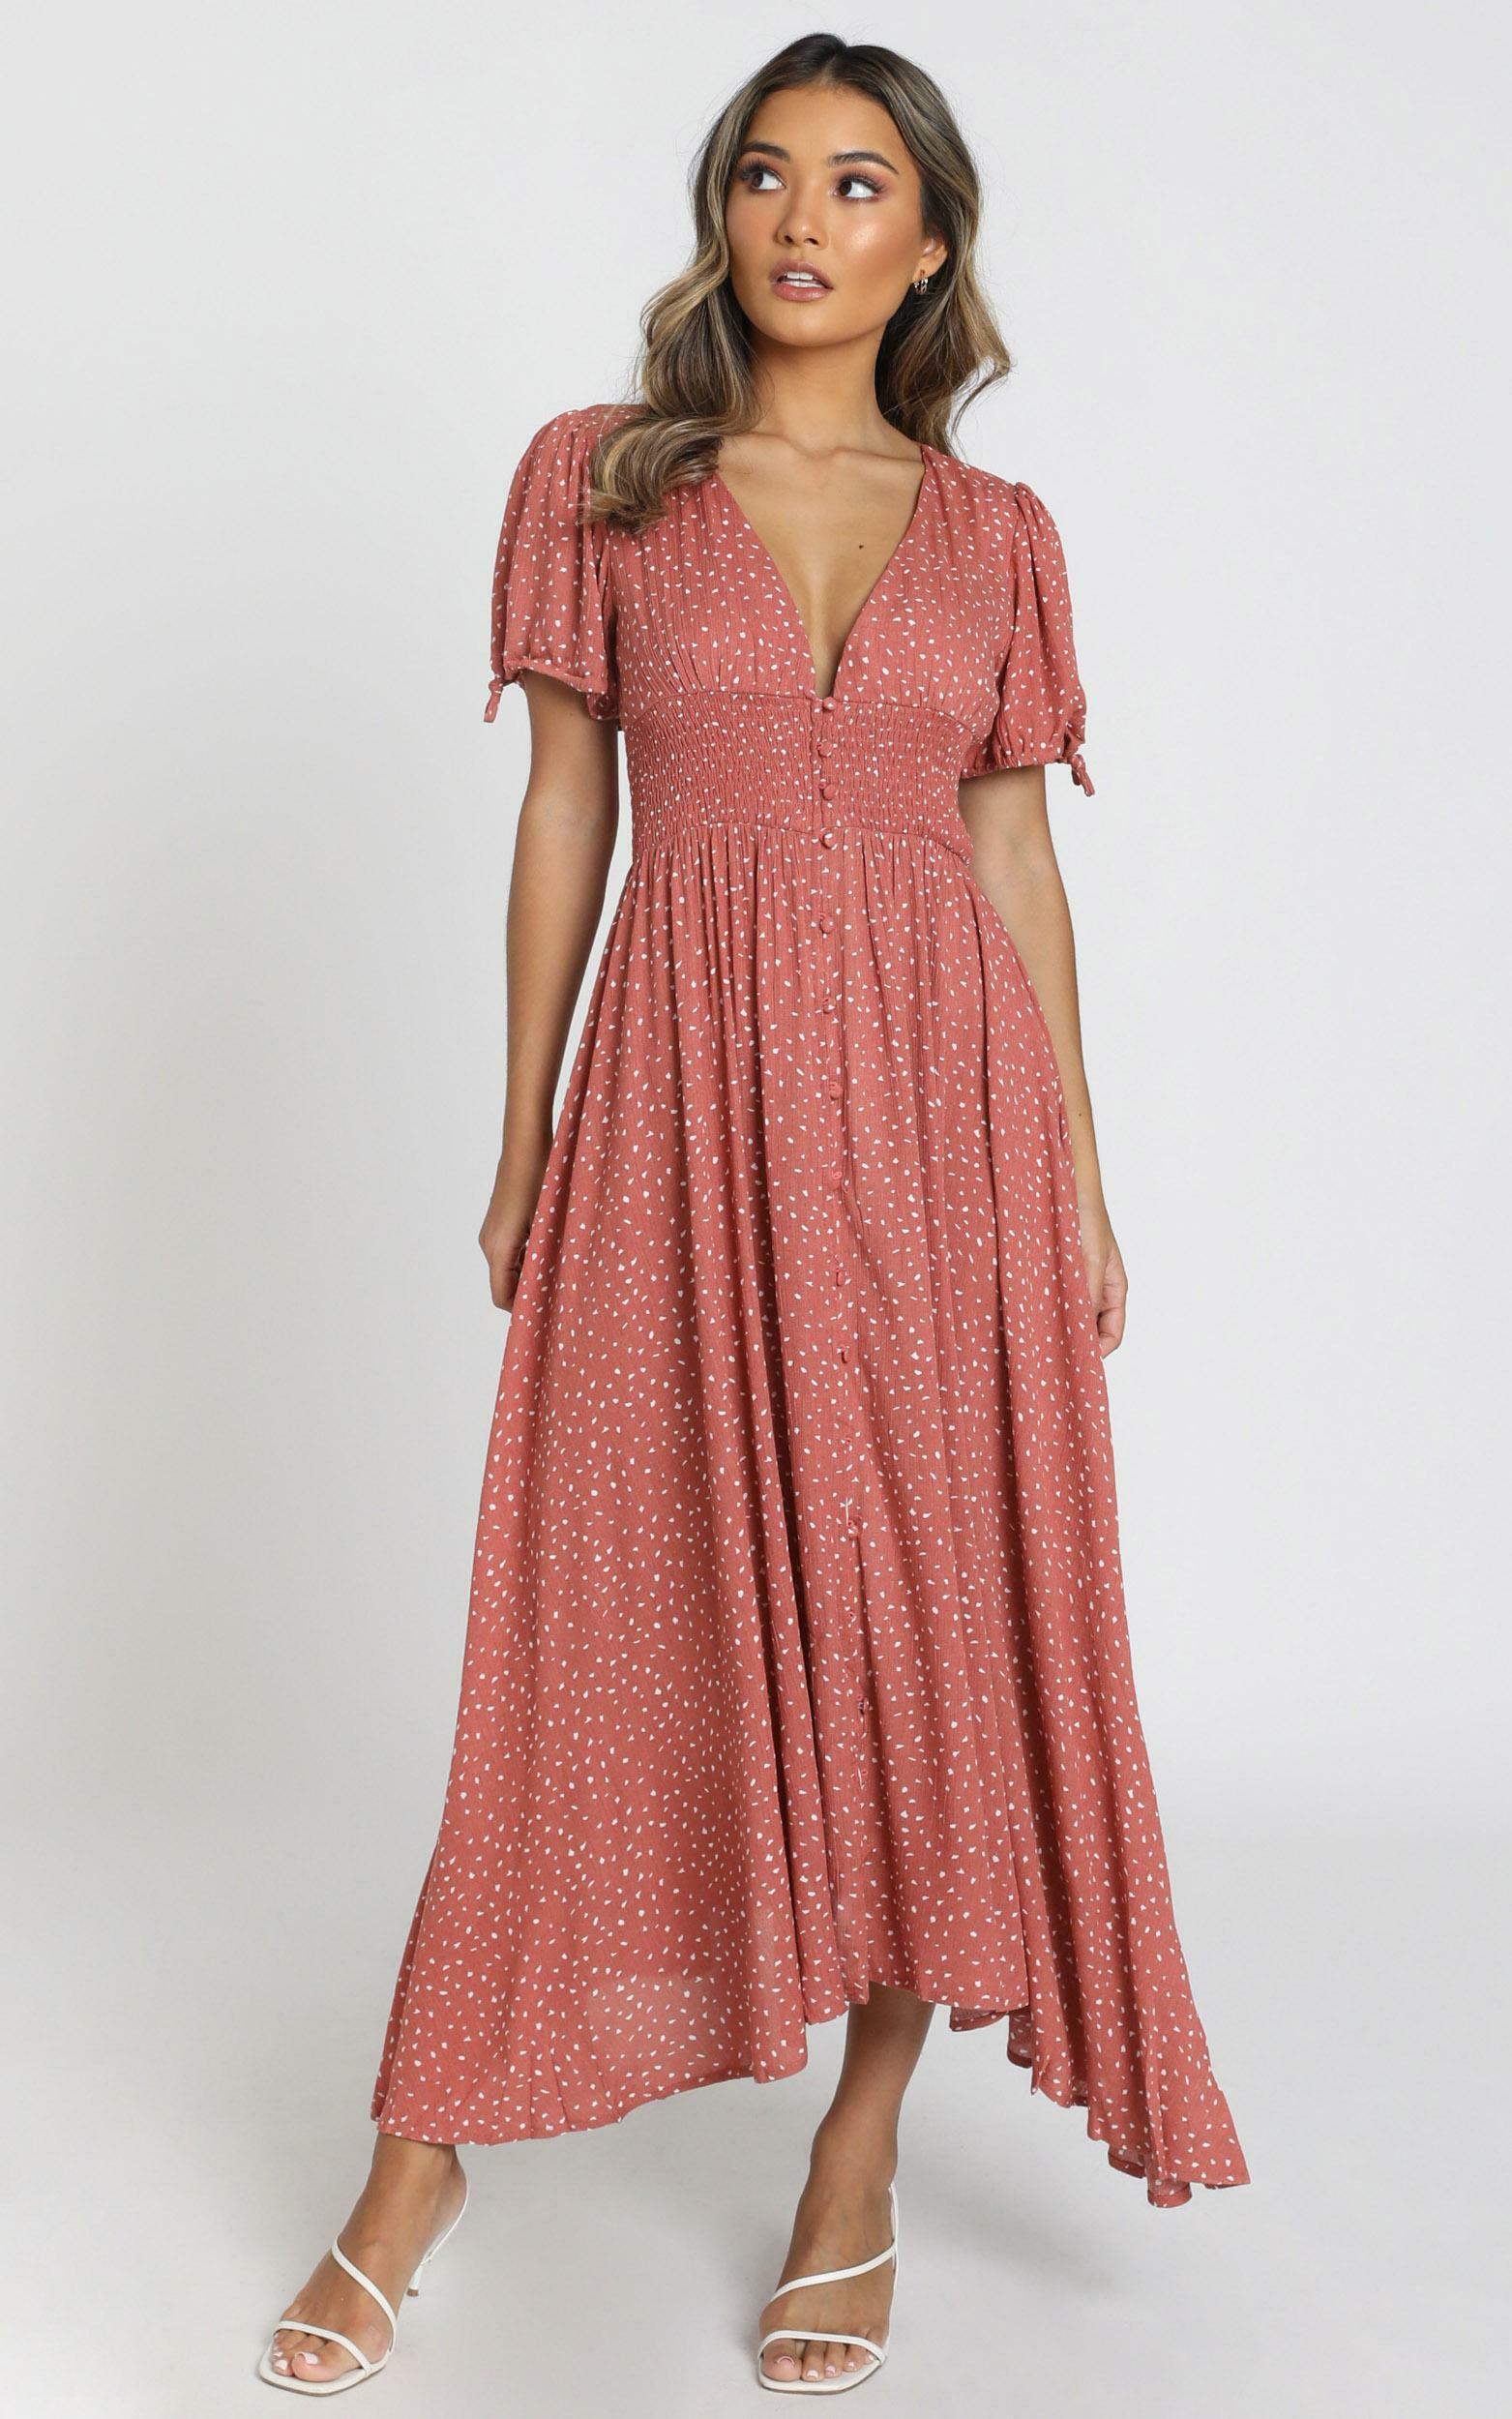 Claudia Midi Dress in rust spot - 6 (XS), Rust, hi-res image number null